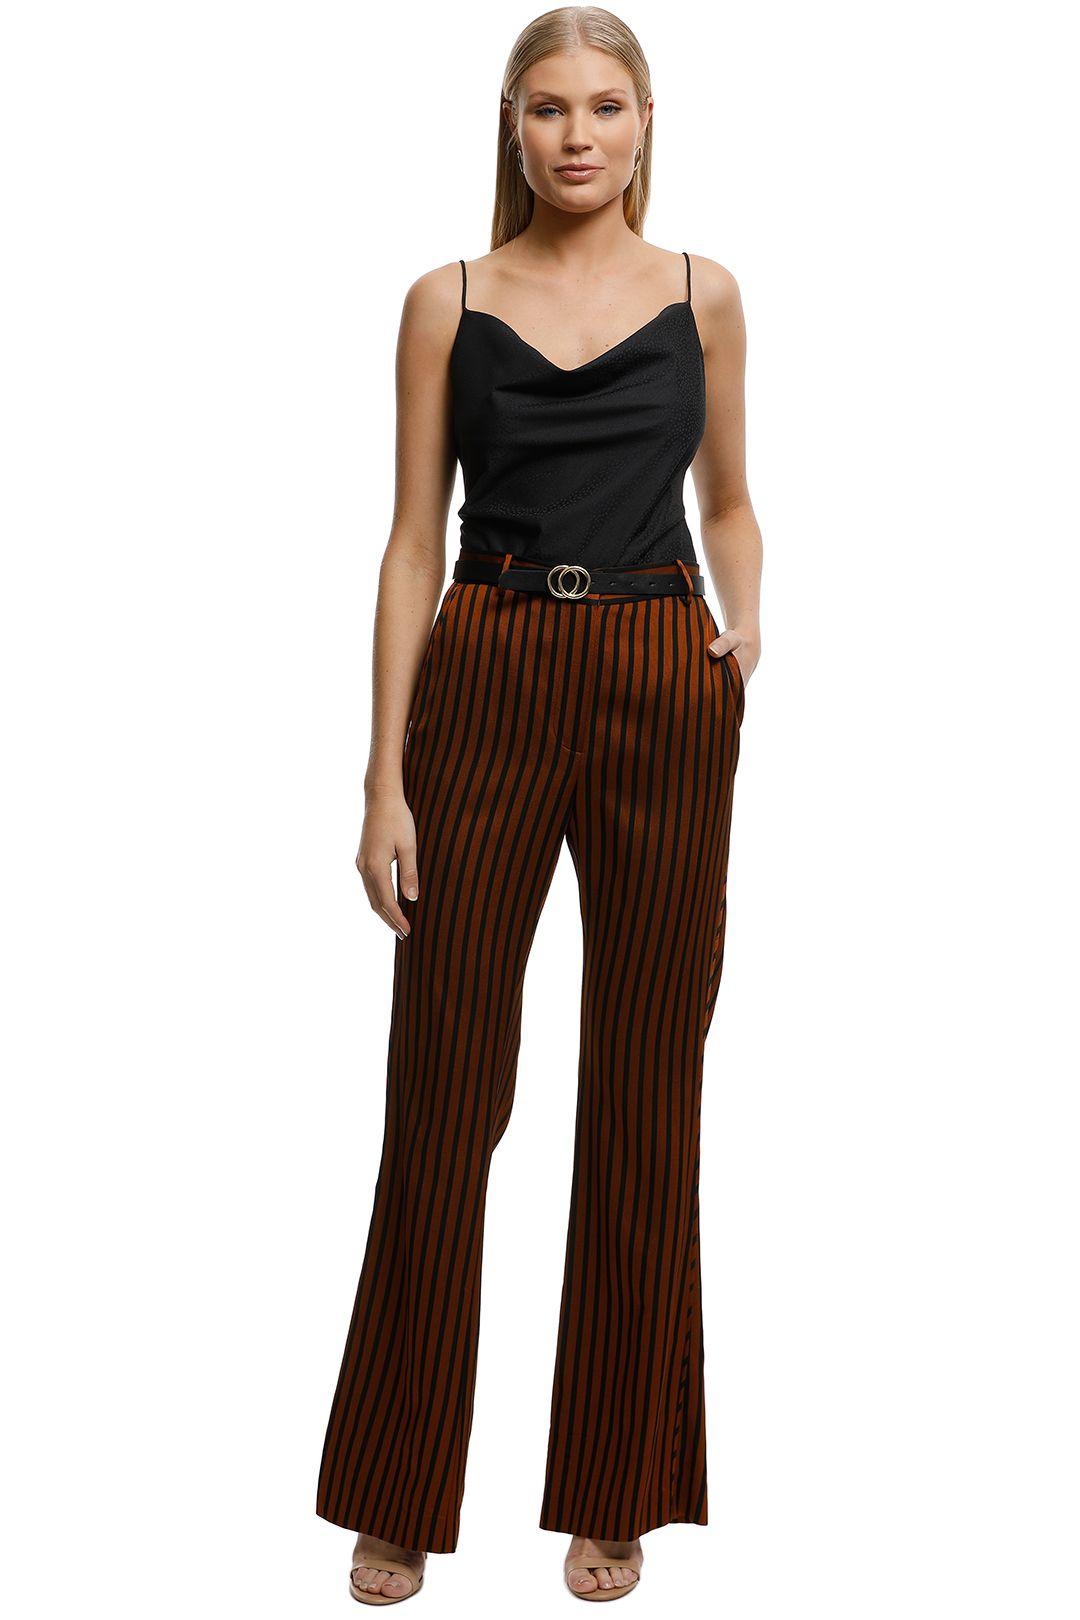 Lover-Liberation-Stripe-Pant-Chestnut-Stripe-Front